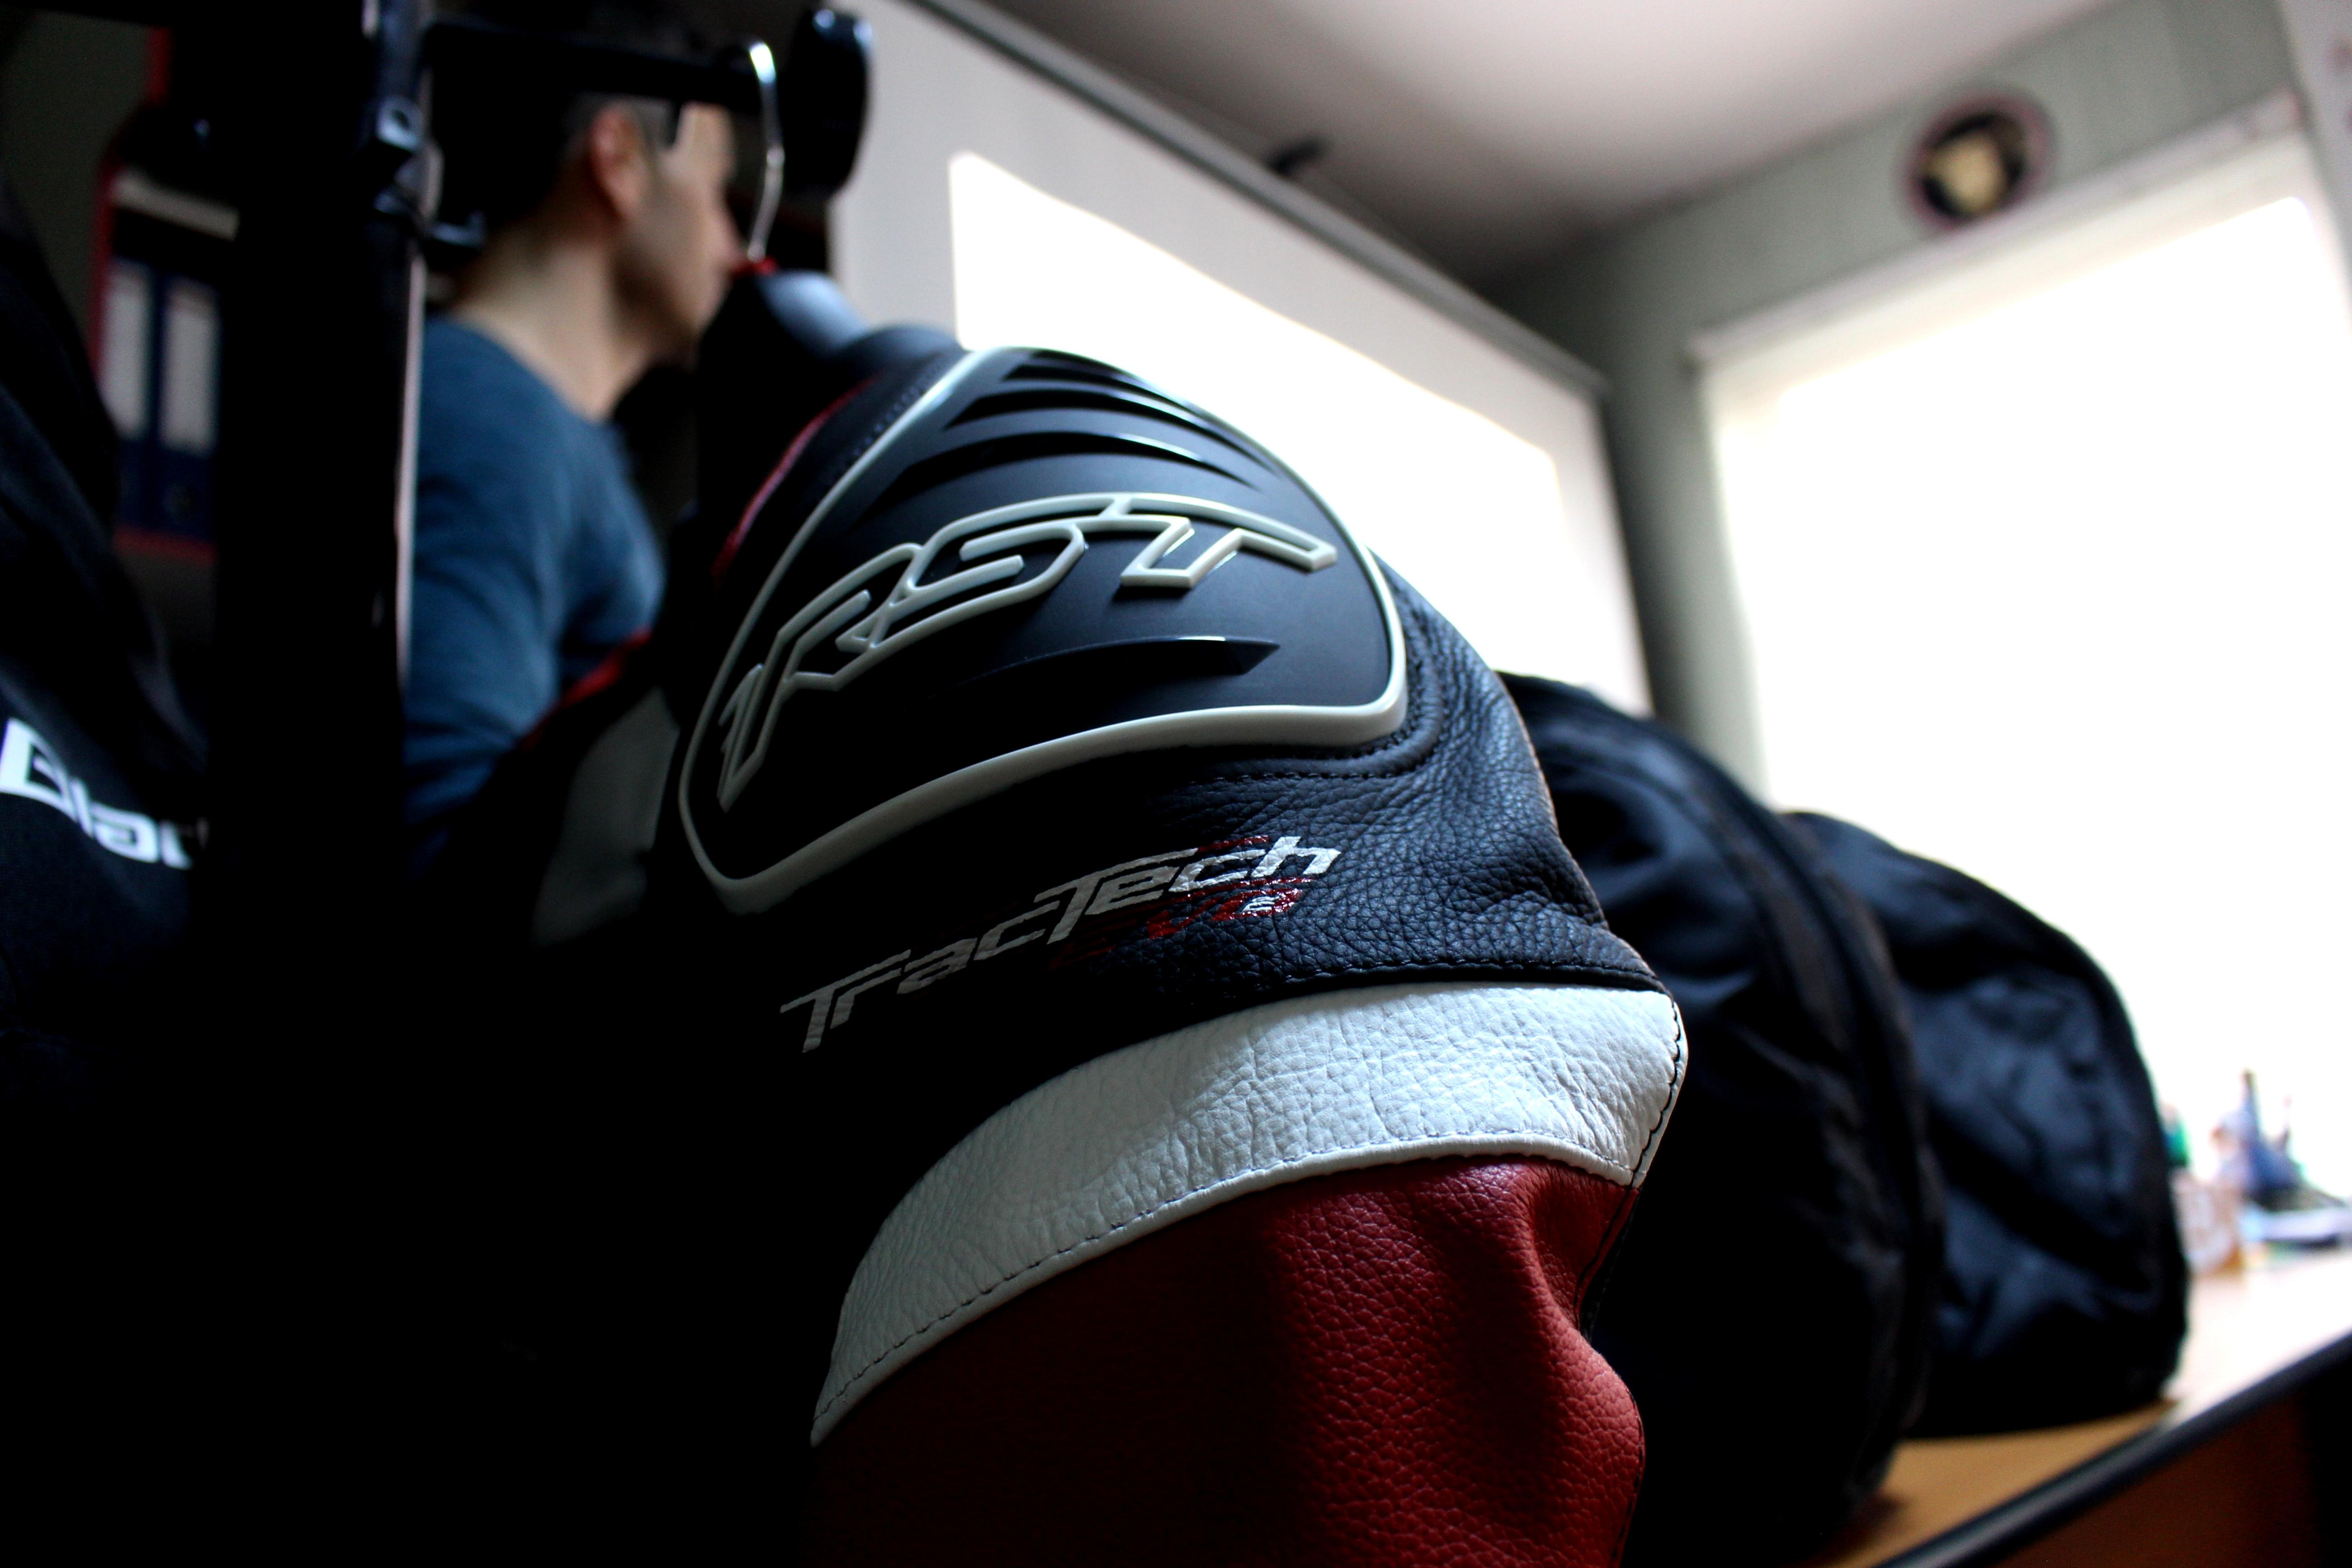 curs echipamente moto - scoala ami - shop4moto